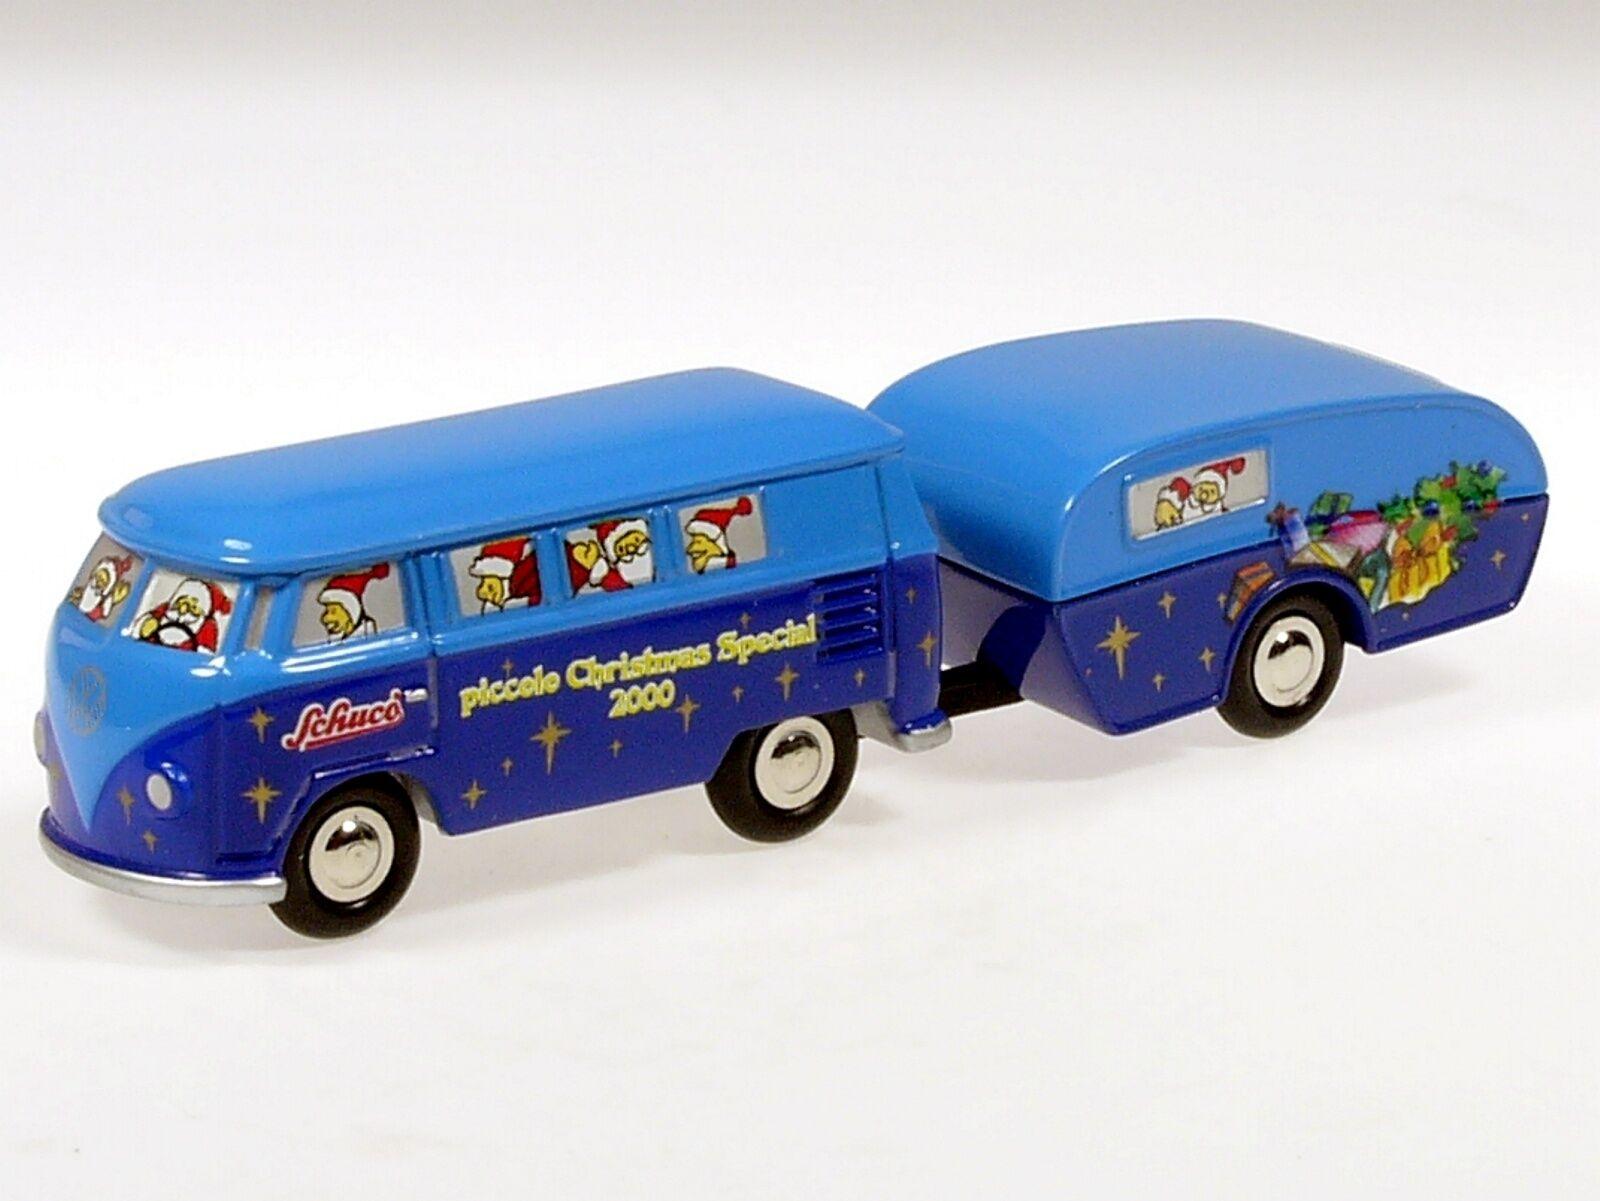 Schuco Piccolo Christmas Edition 2000  VW Bus Camper   50188200  le plus en vogue